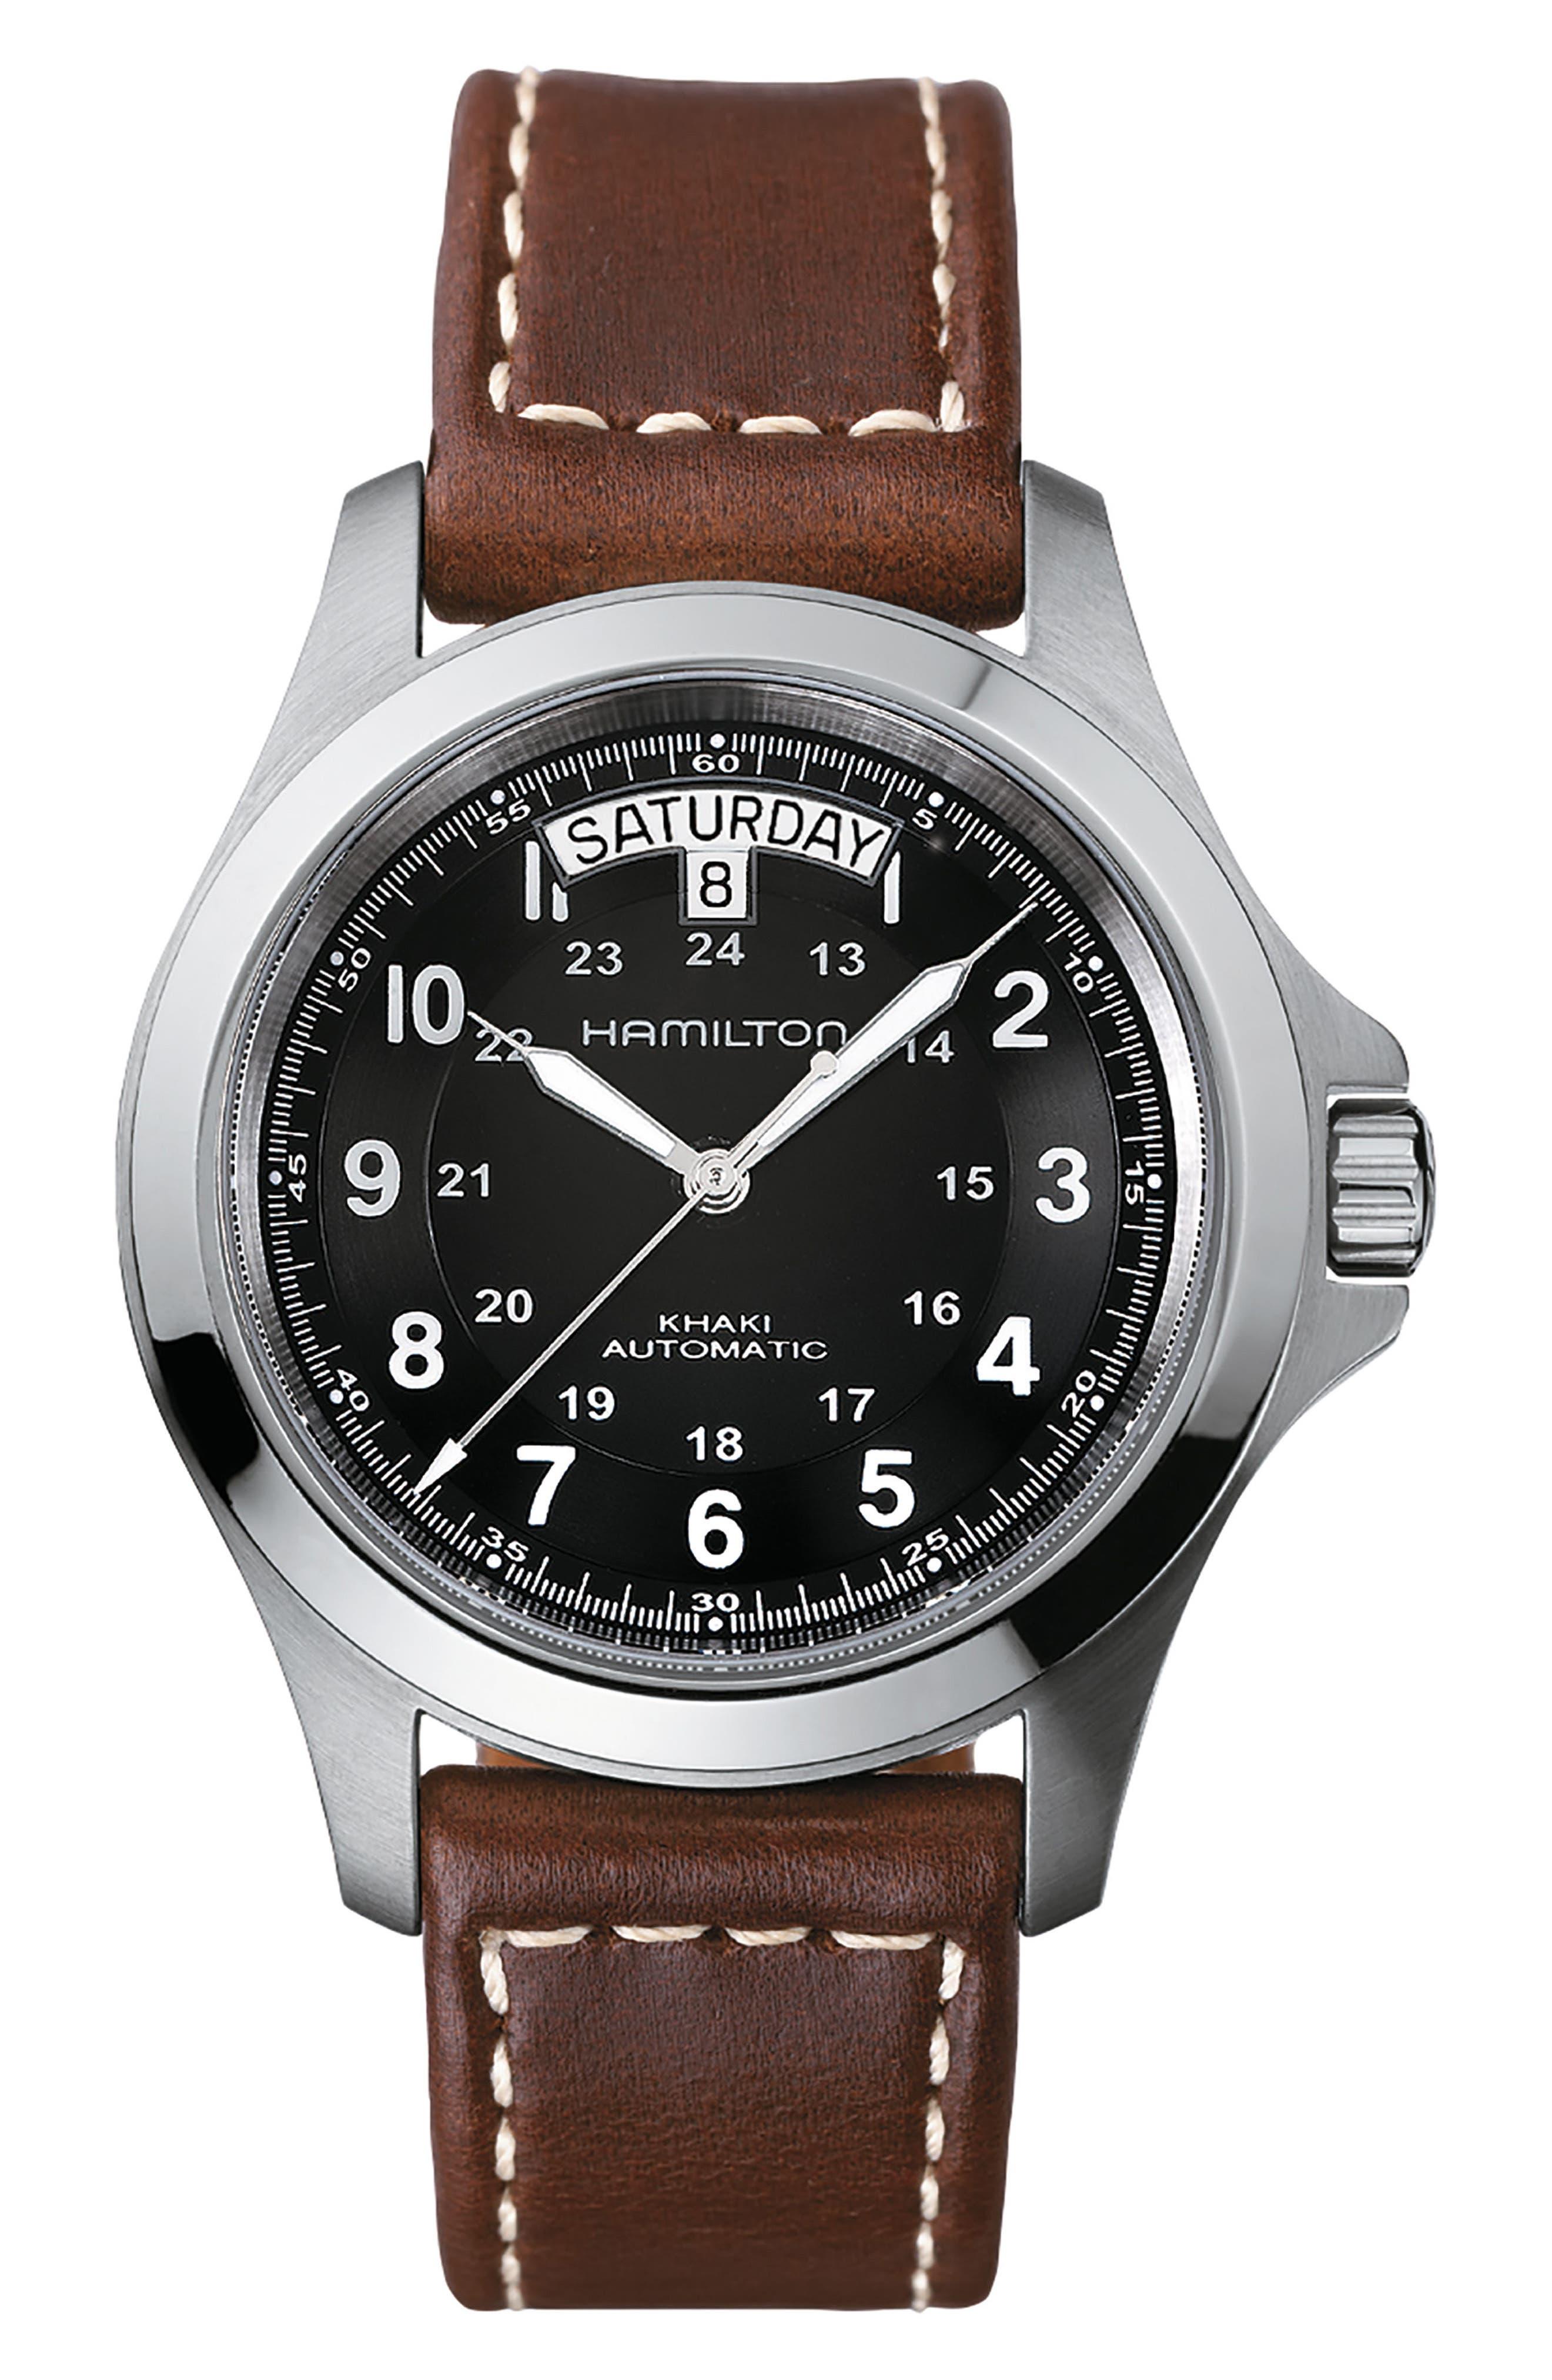 Khaki King Automatic Leather Strap Watch